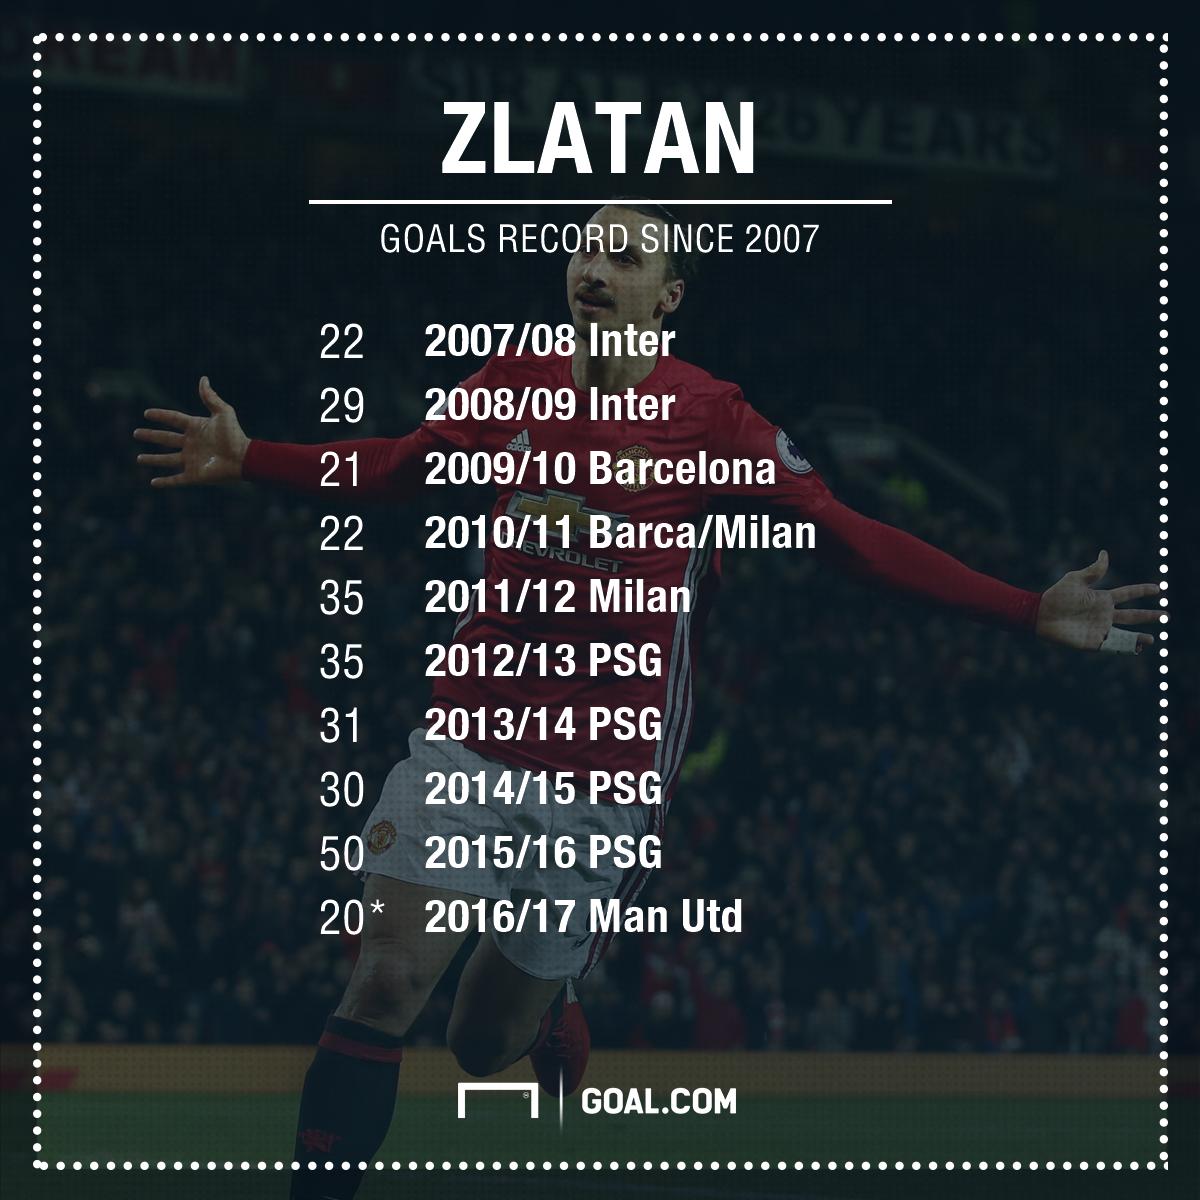 Zlatan Ibrahimovic goals 05-02-17